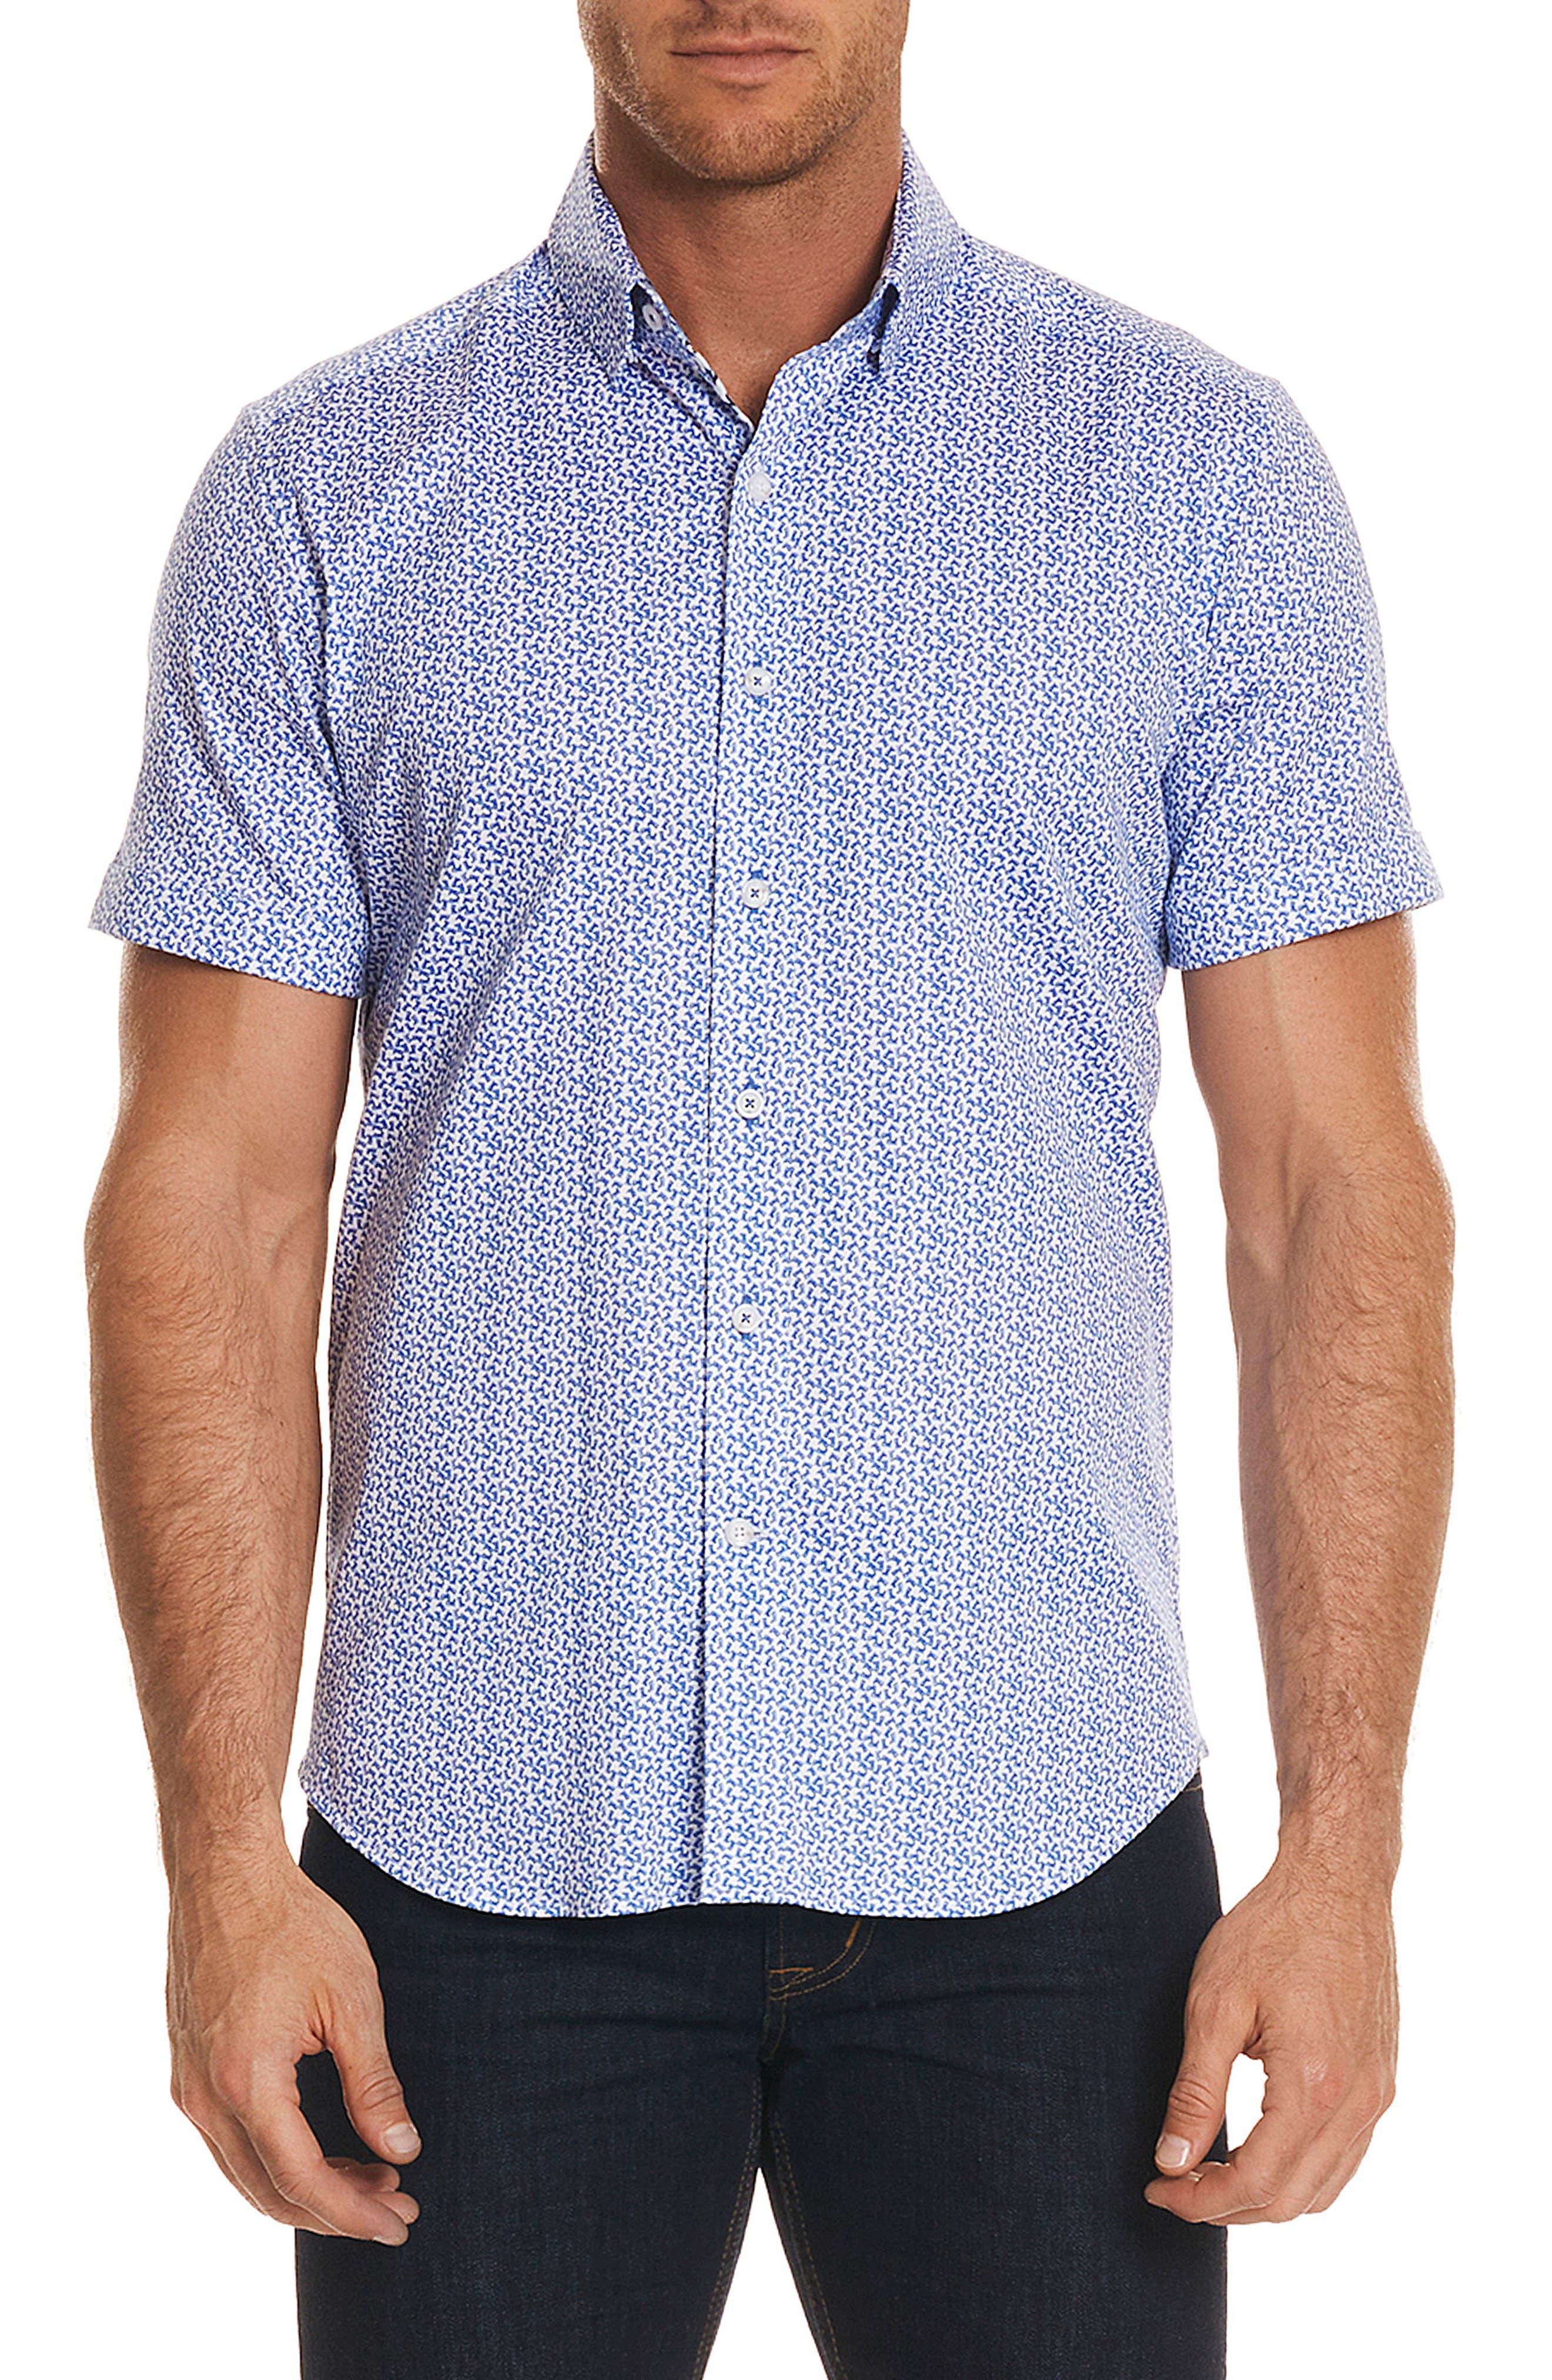 Hartman Tailored Fit Sport Shirt,                             Main thumbnail 1, color,